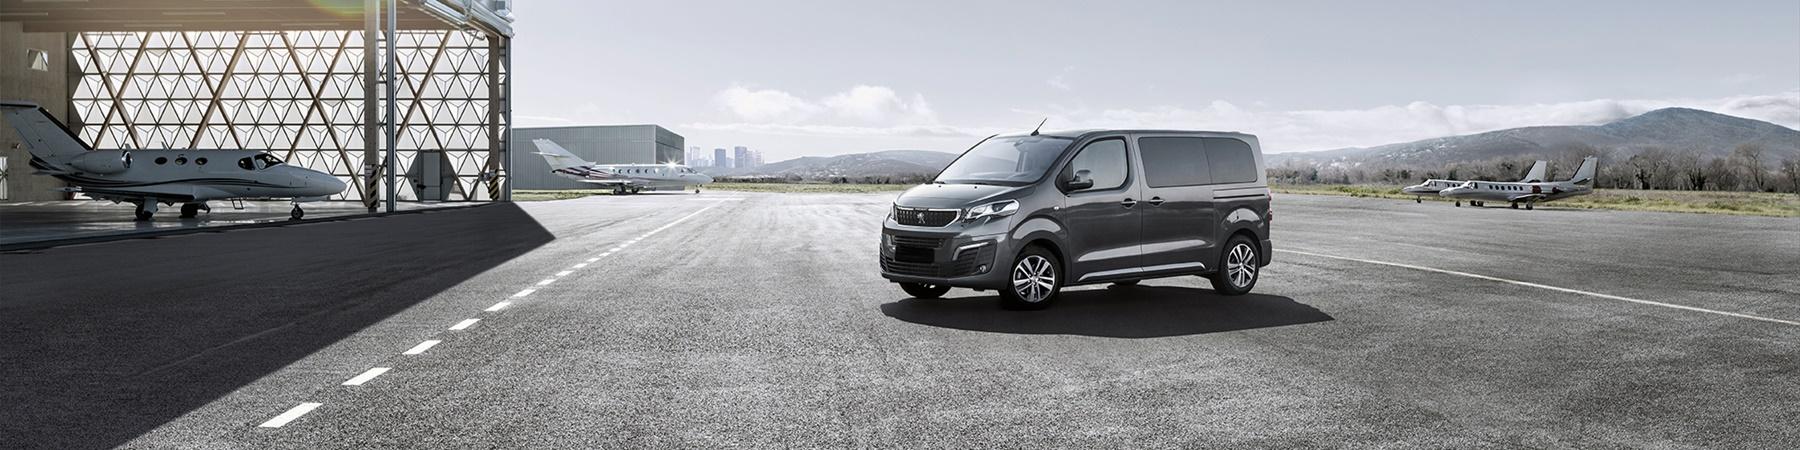 Peugeot Traveller 50kWh 196 km actieradius